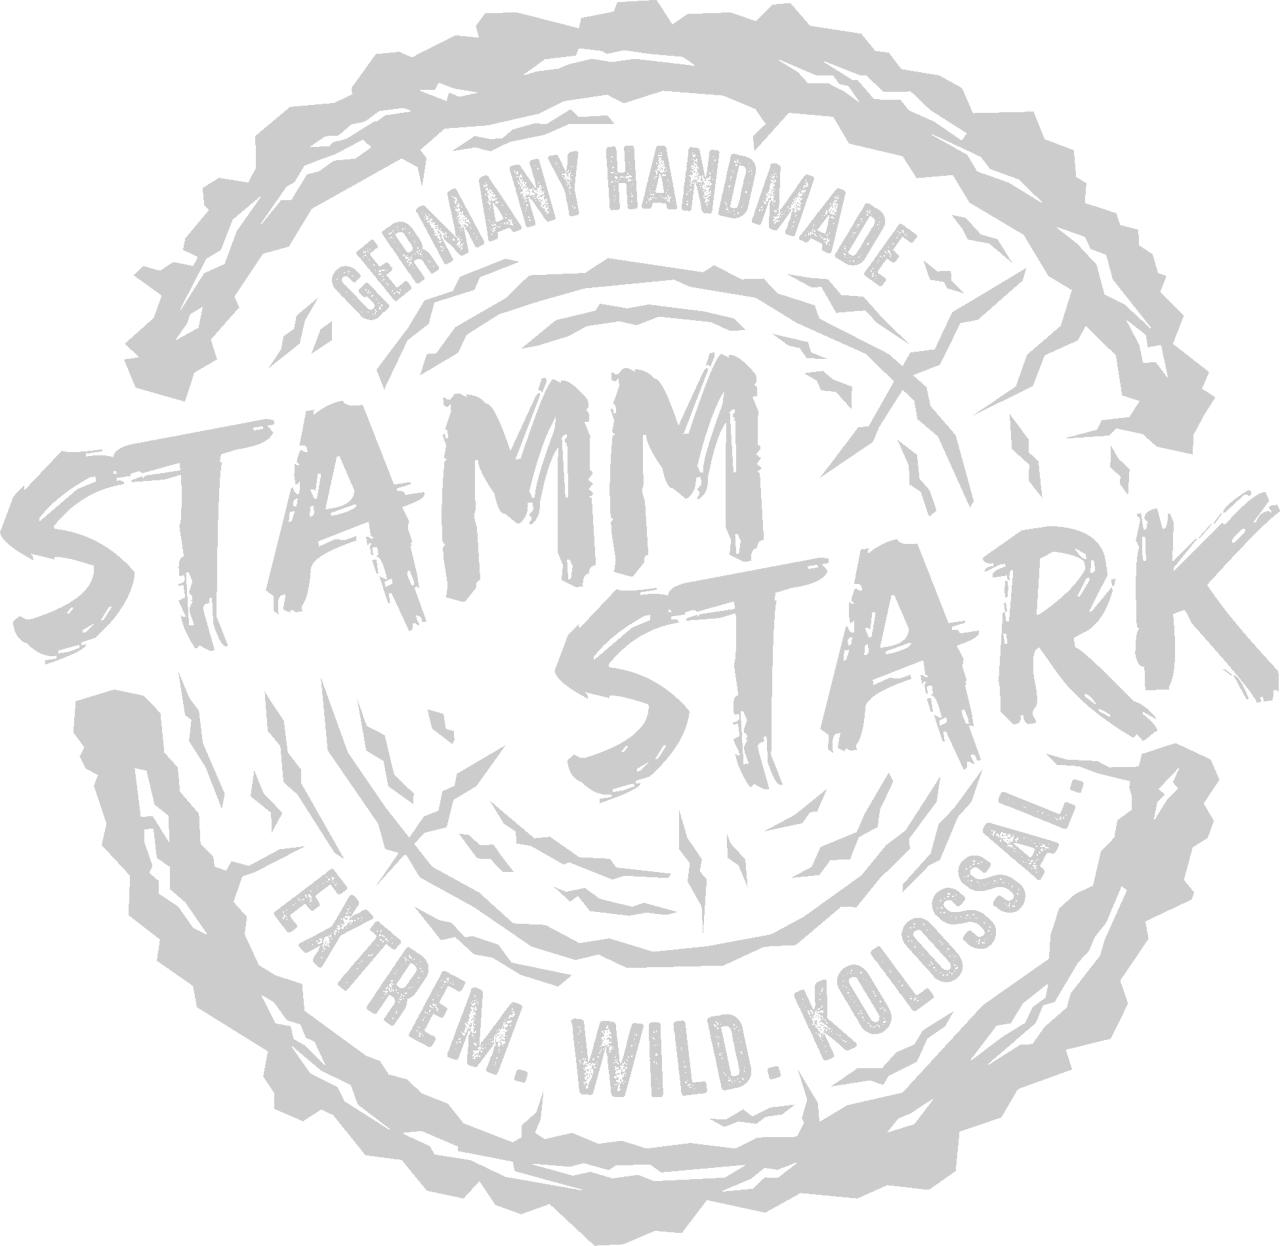 Logo WP Stammstark Germany